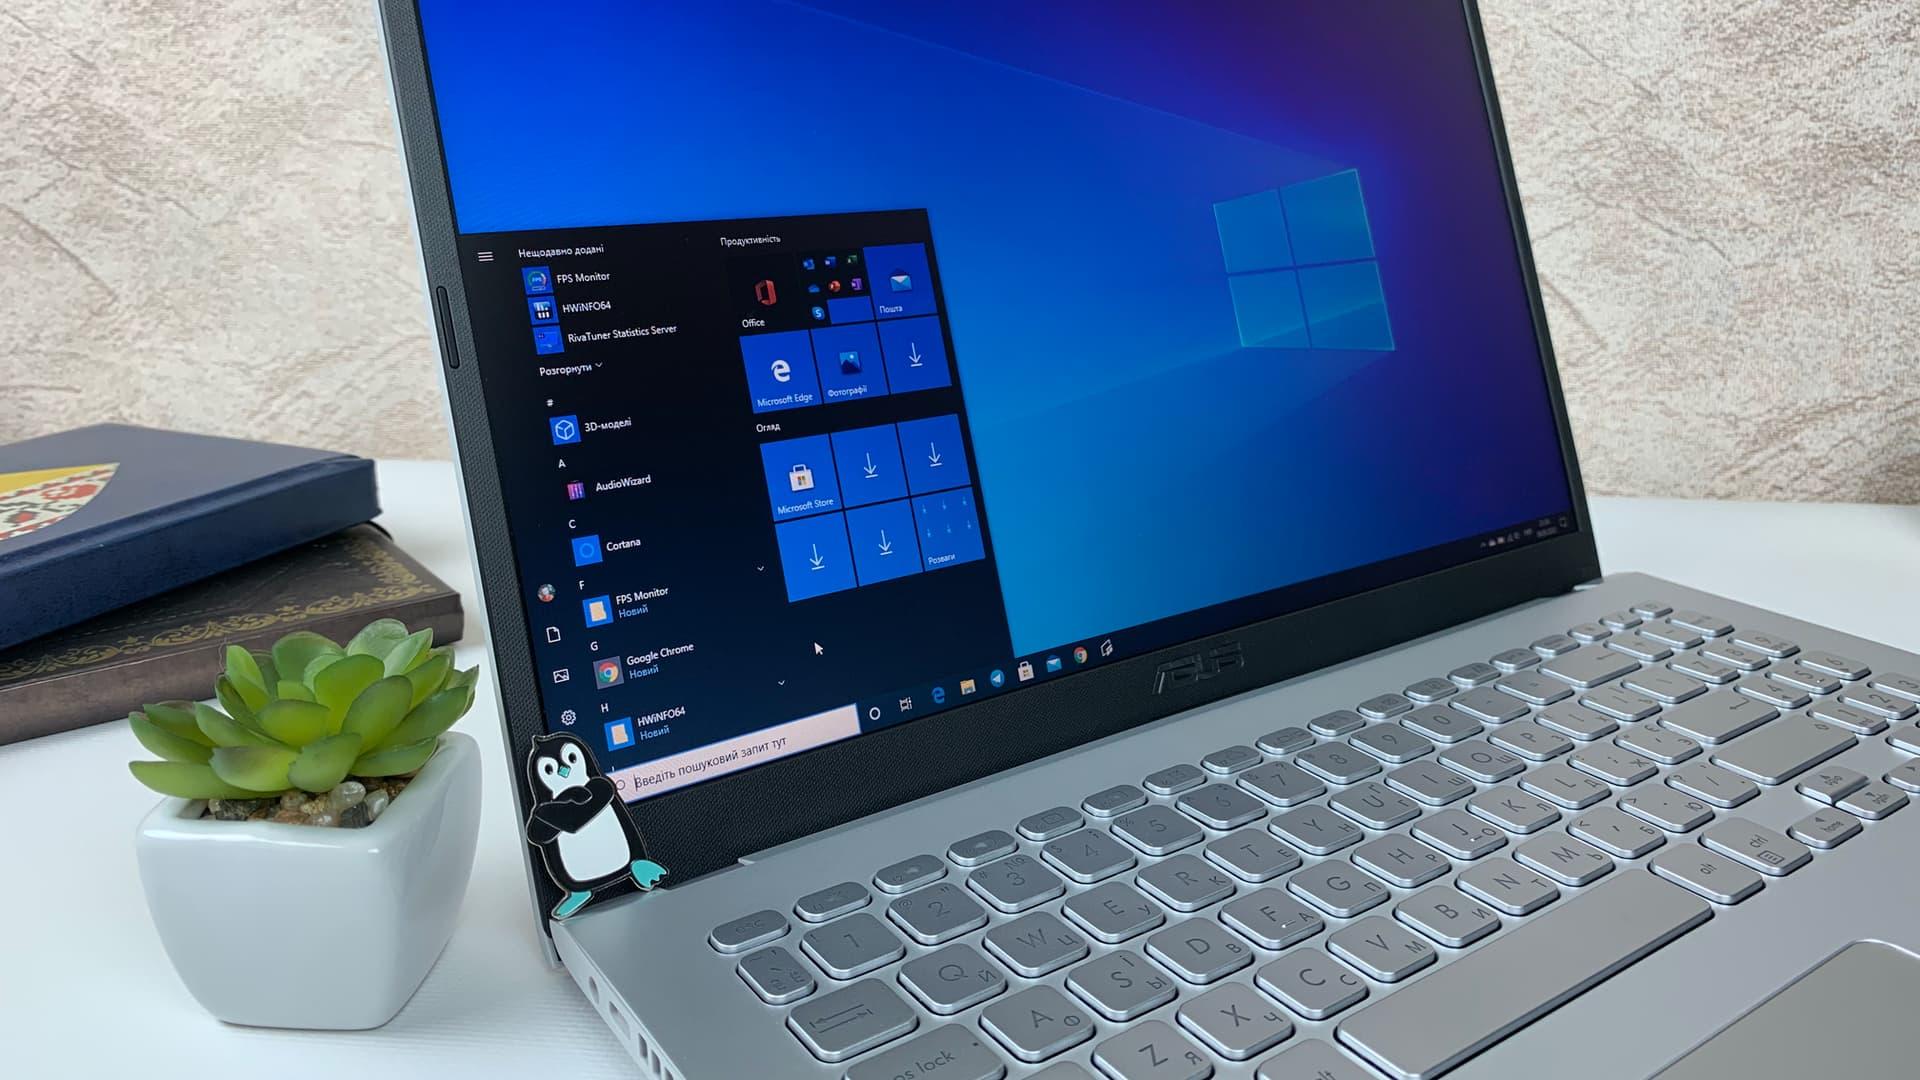 Windows 10 ASUS X509JP EJ070 / Windows 10 20H2